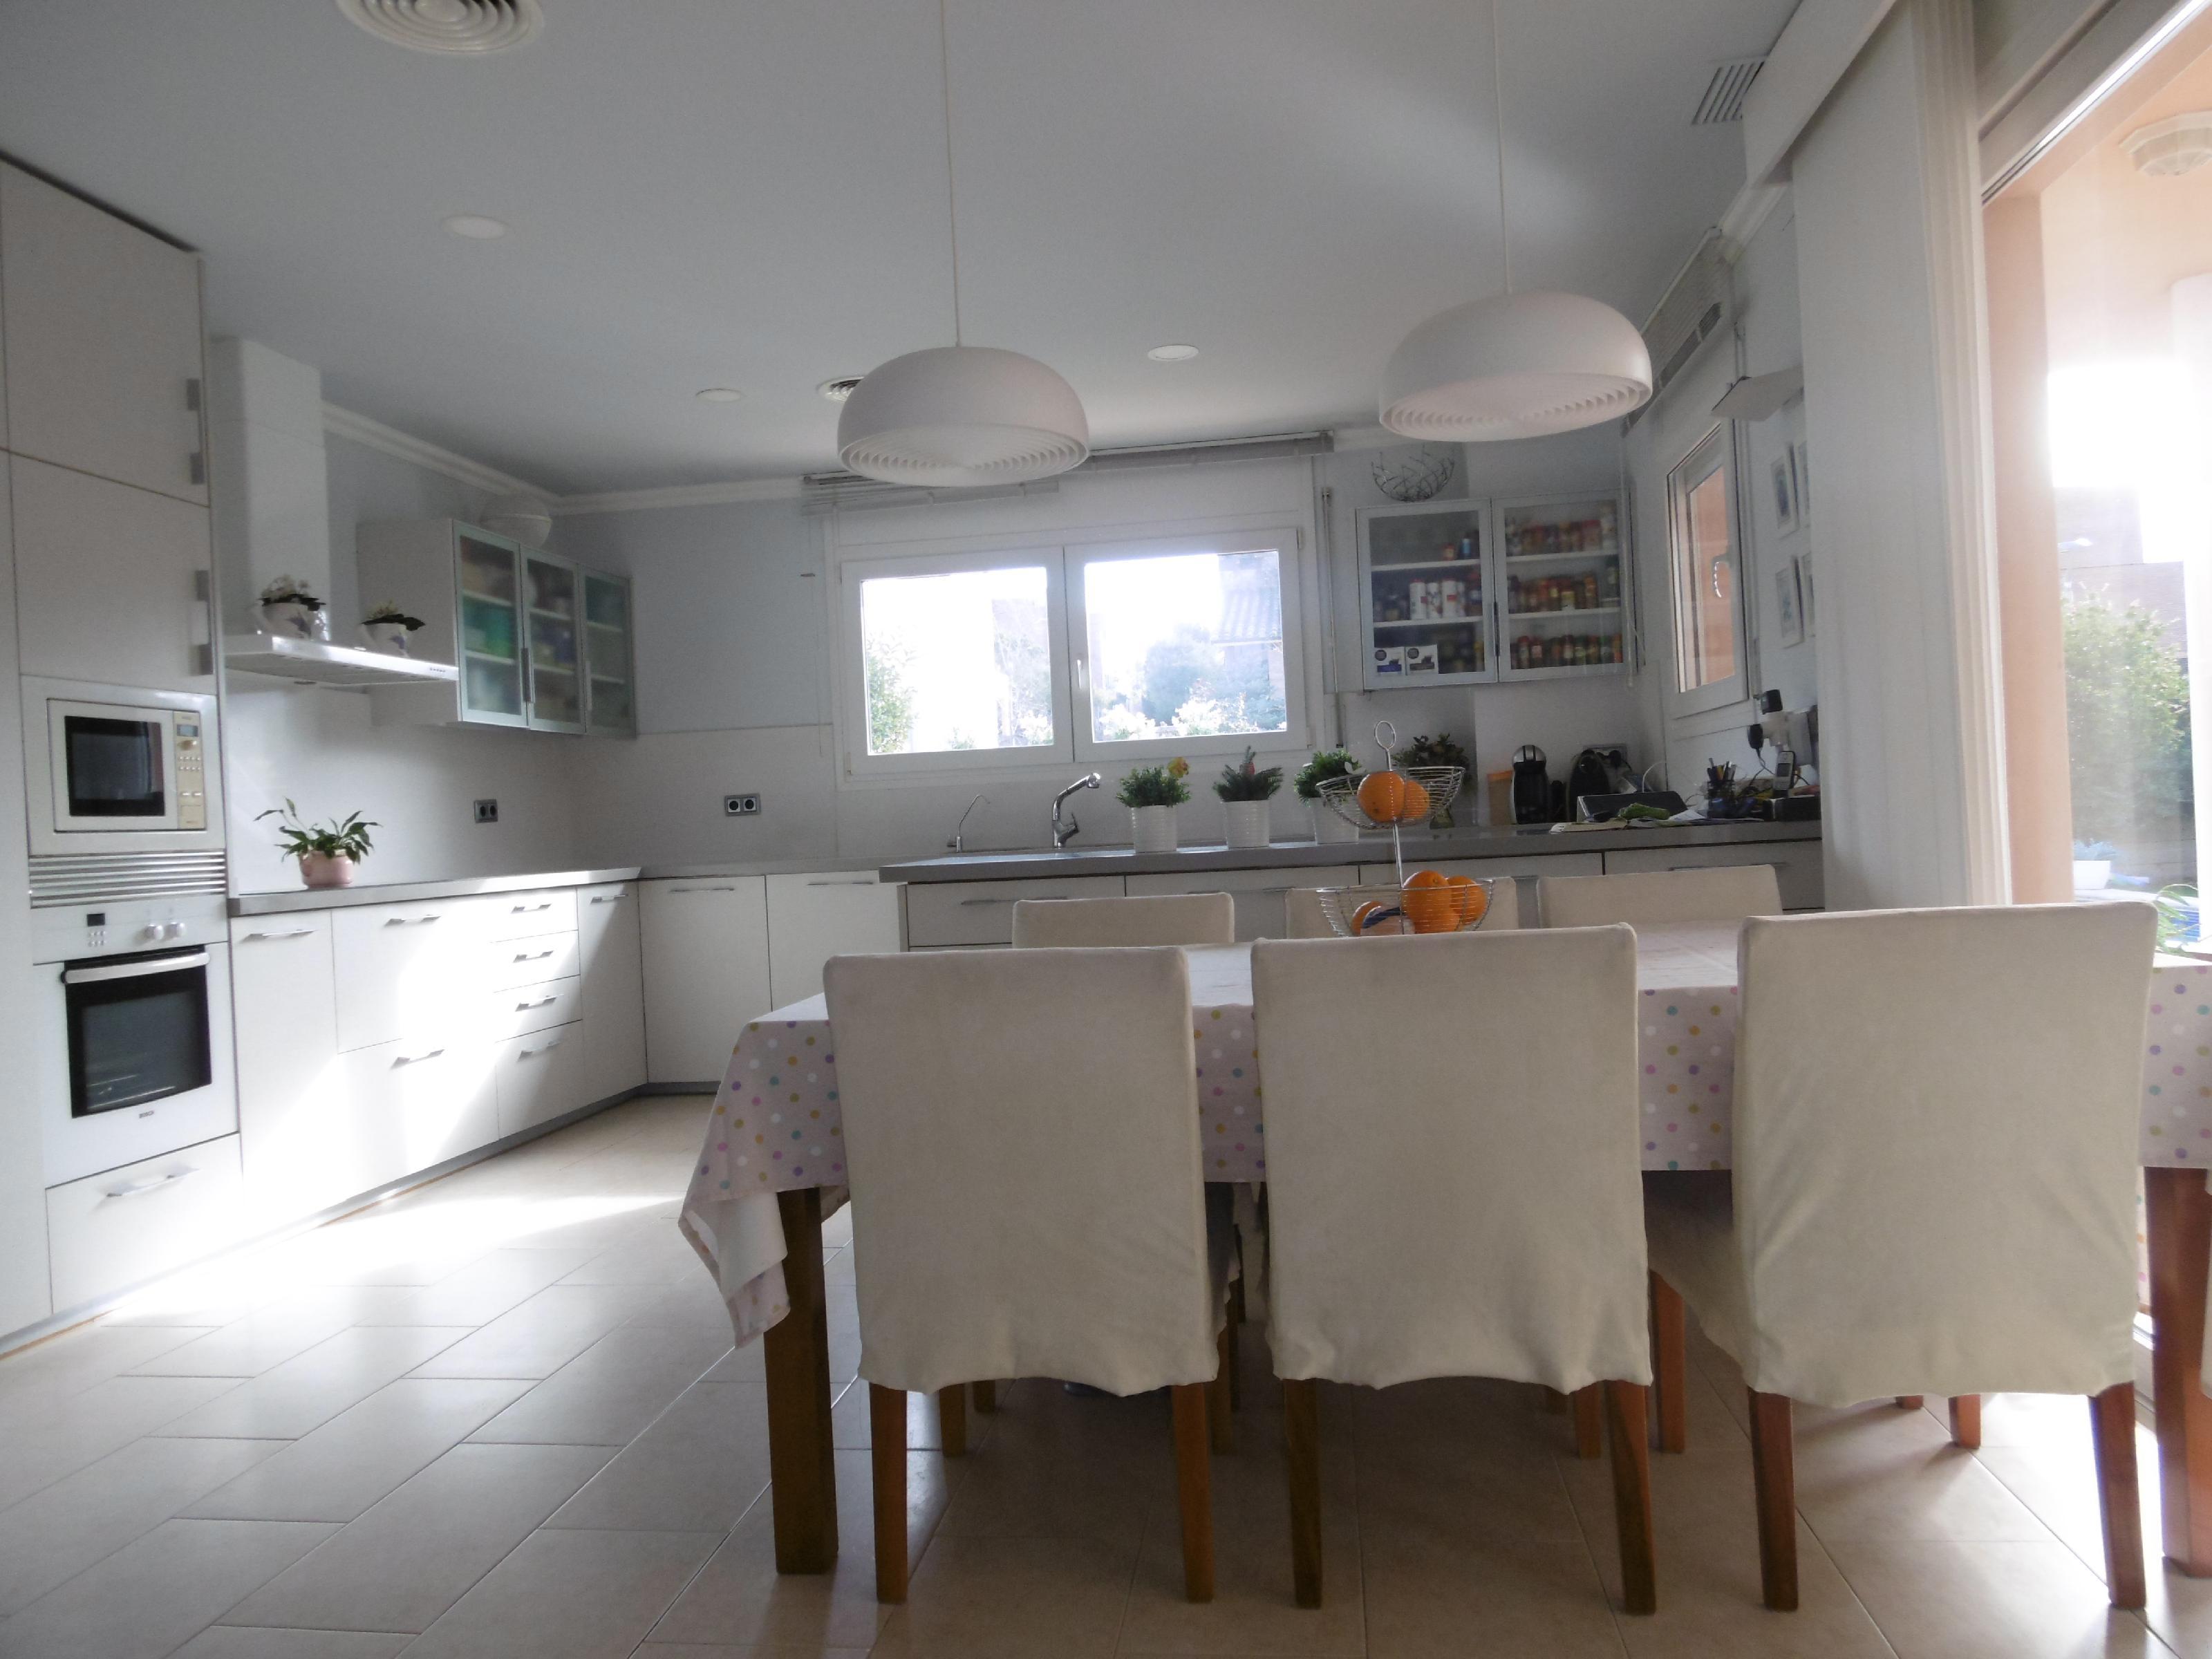 Imagen 4 Casa Aislada en venta en Molins De Rei / Riera Nova Molins